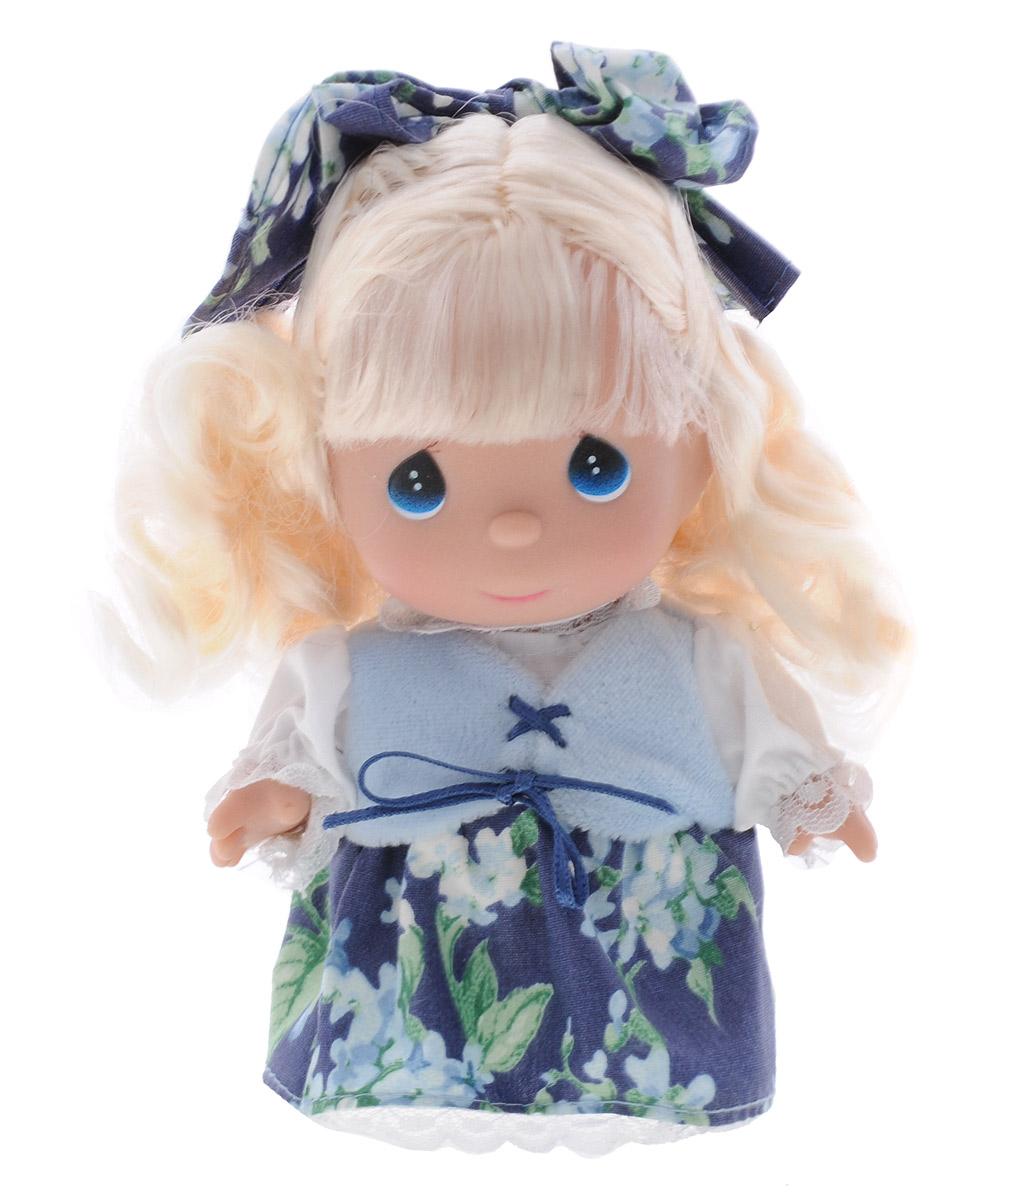 Precious Moments Мини-кукла Лютик золотистый precious moments кукла покахонтас